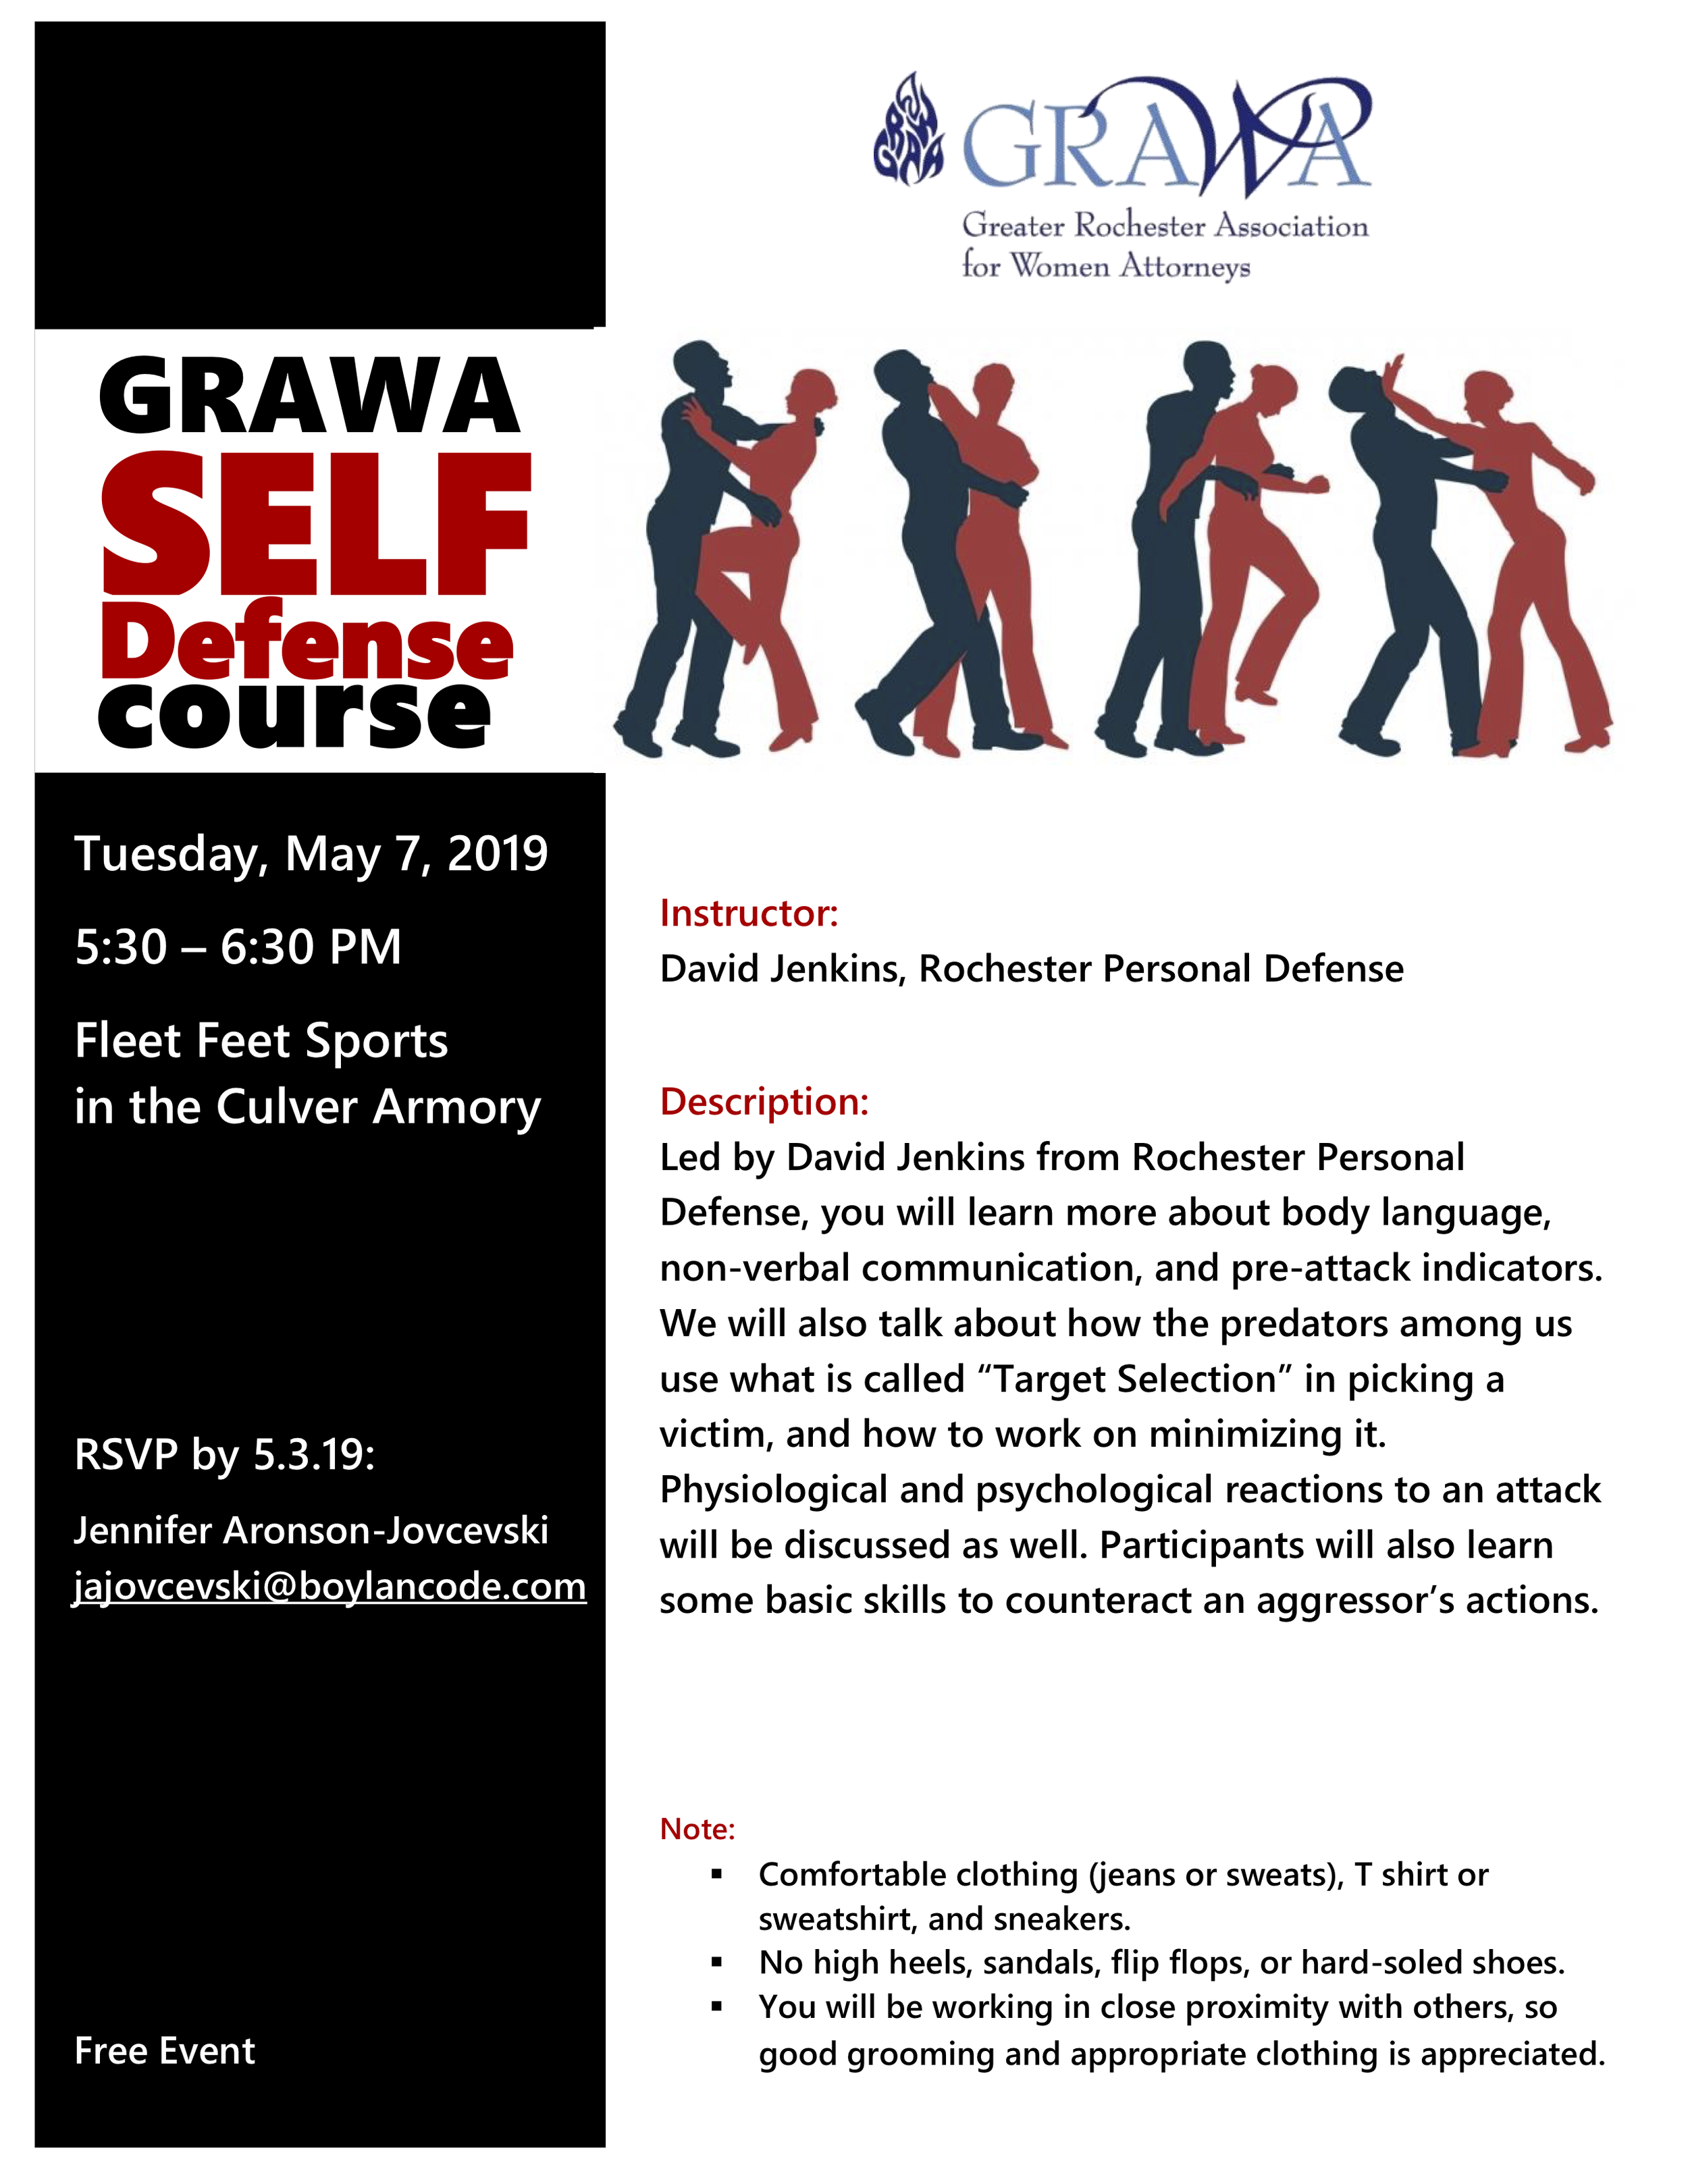 GRAWA Self Defense event.png